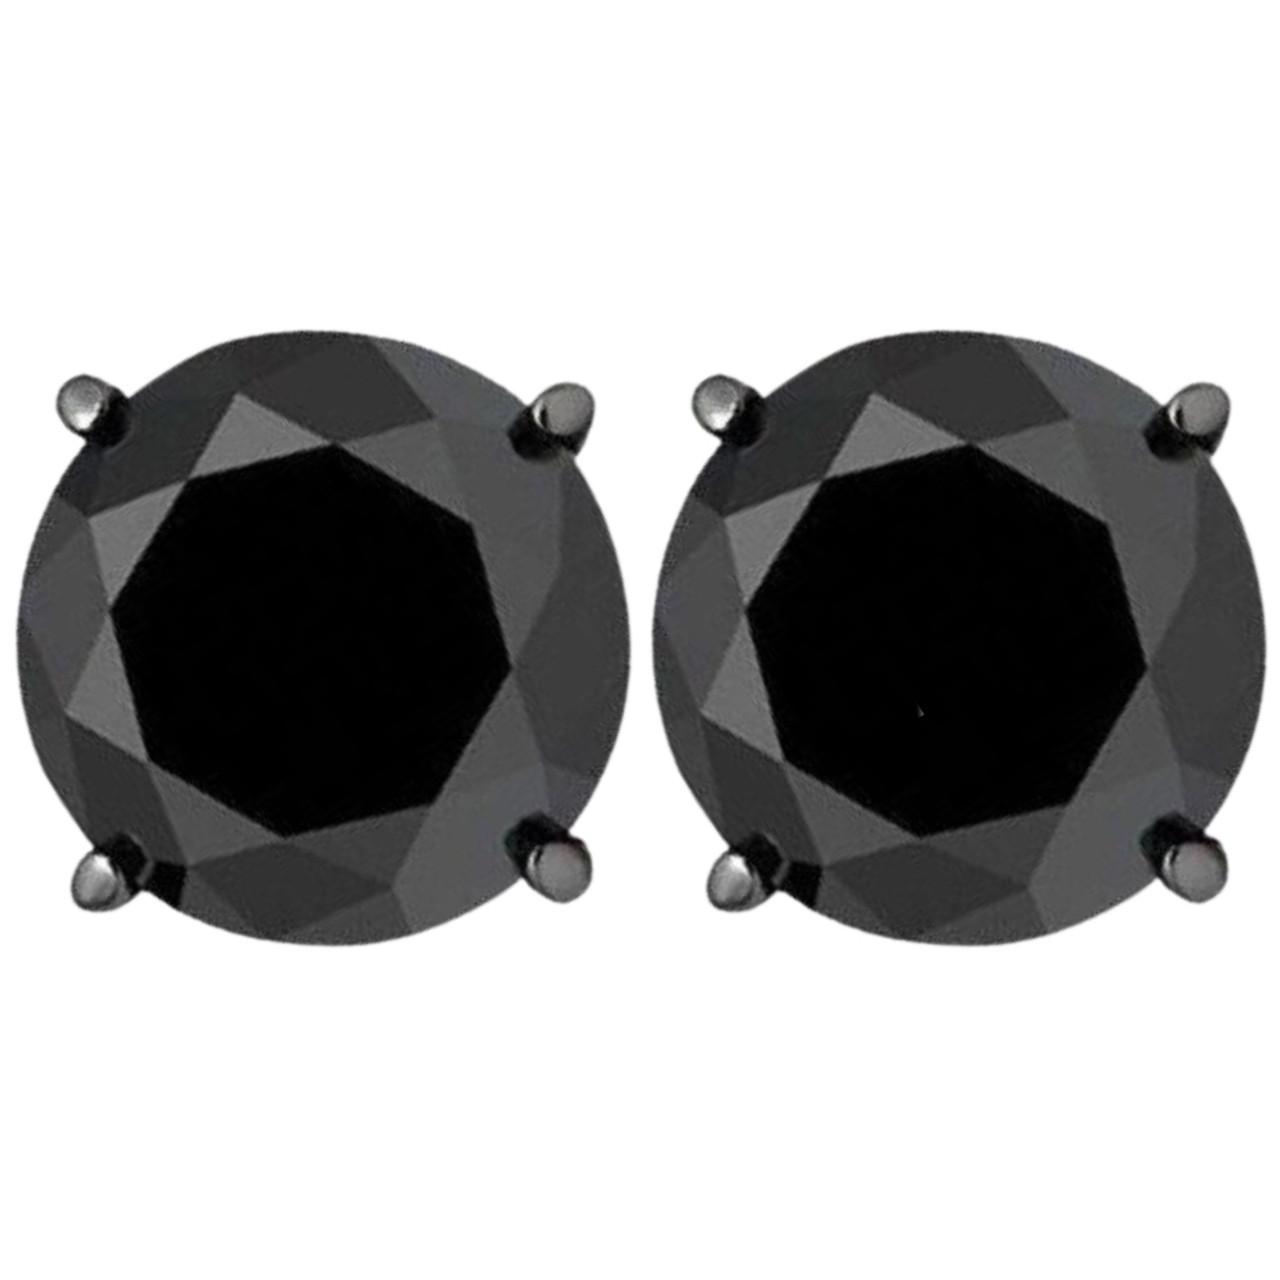 3ct 14k Black Gold Round Black Diamond Screw Back Studs Earrings 15ea6d81862b